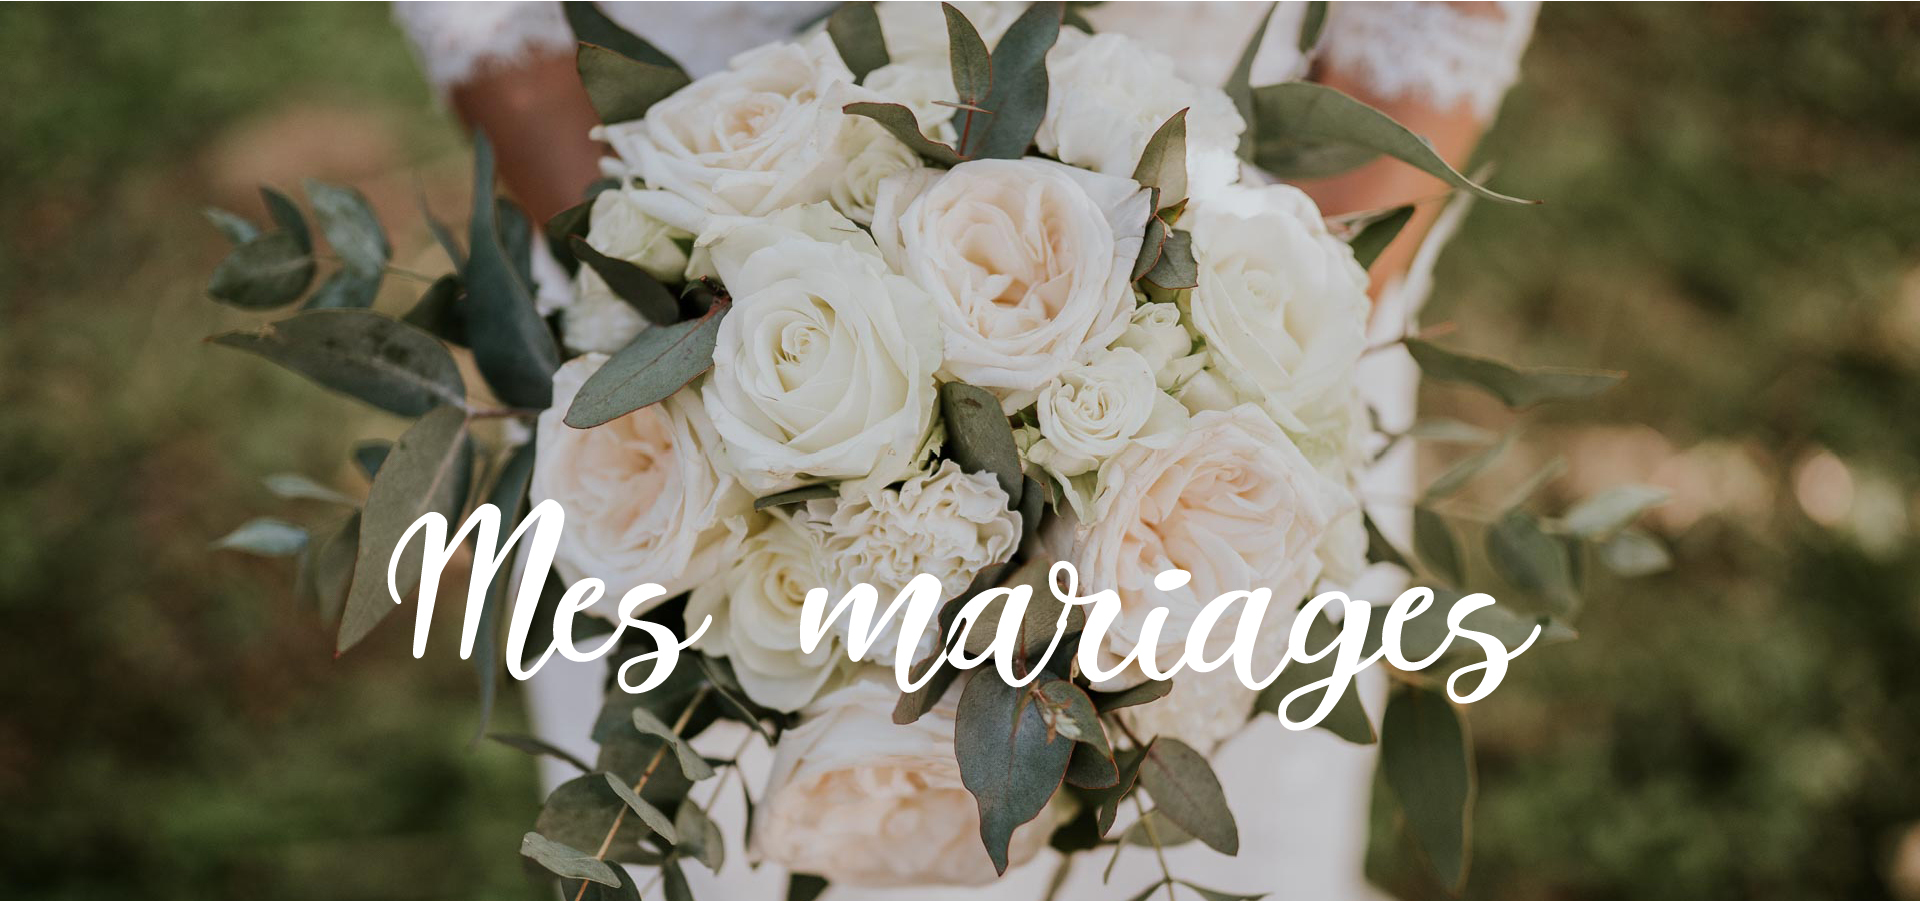 Mes mariages - Hauts-de-France